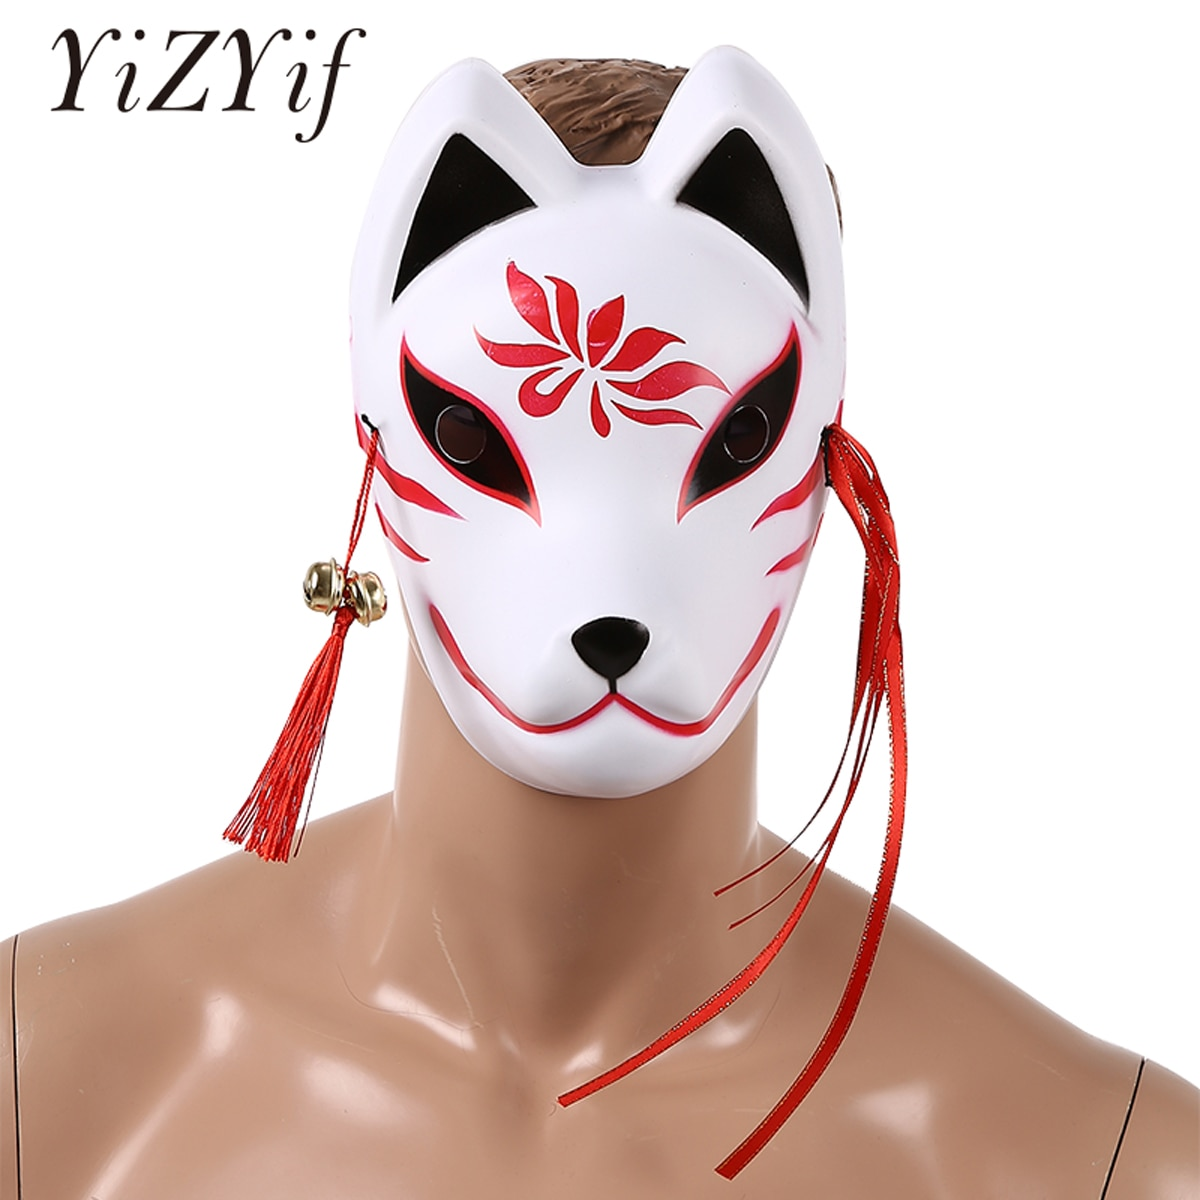 Rosto cheio anime japonês máscara de raposa cosplay máscaras máscaras máscaras com borlas pequenos sinos pvc festival festa de halloween traje